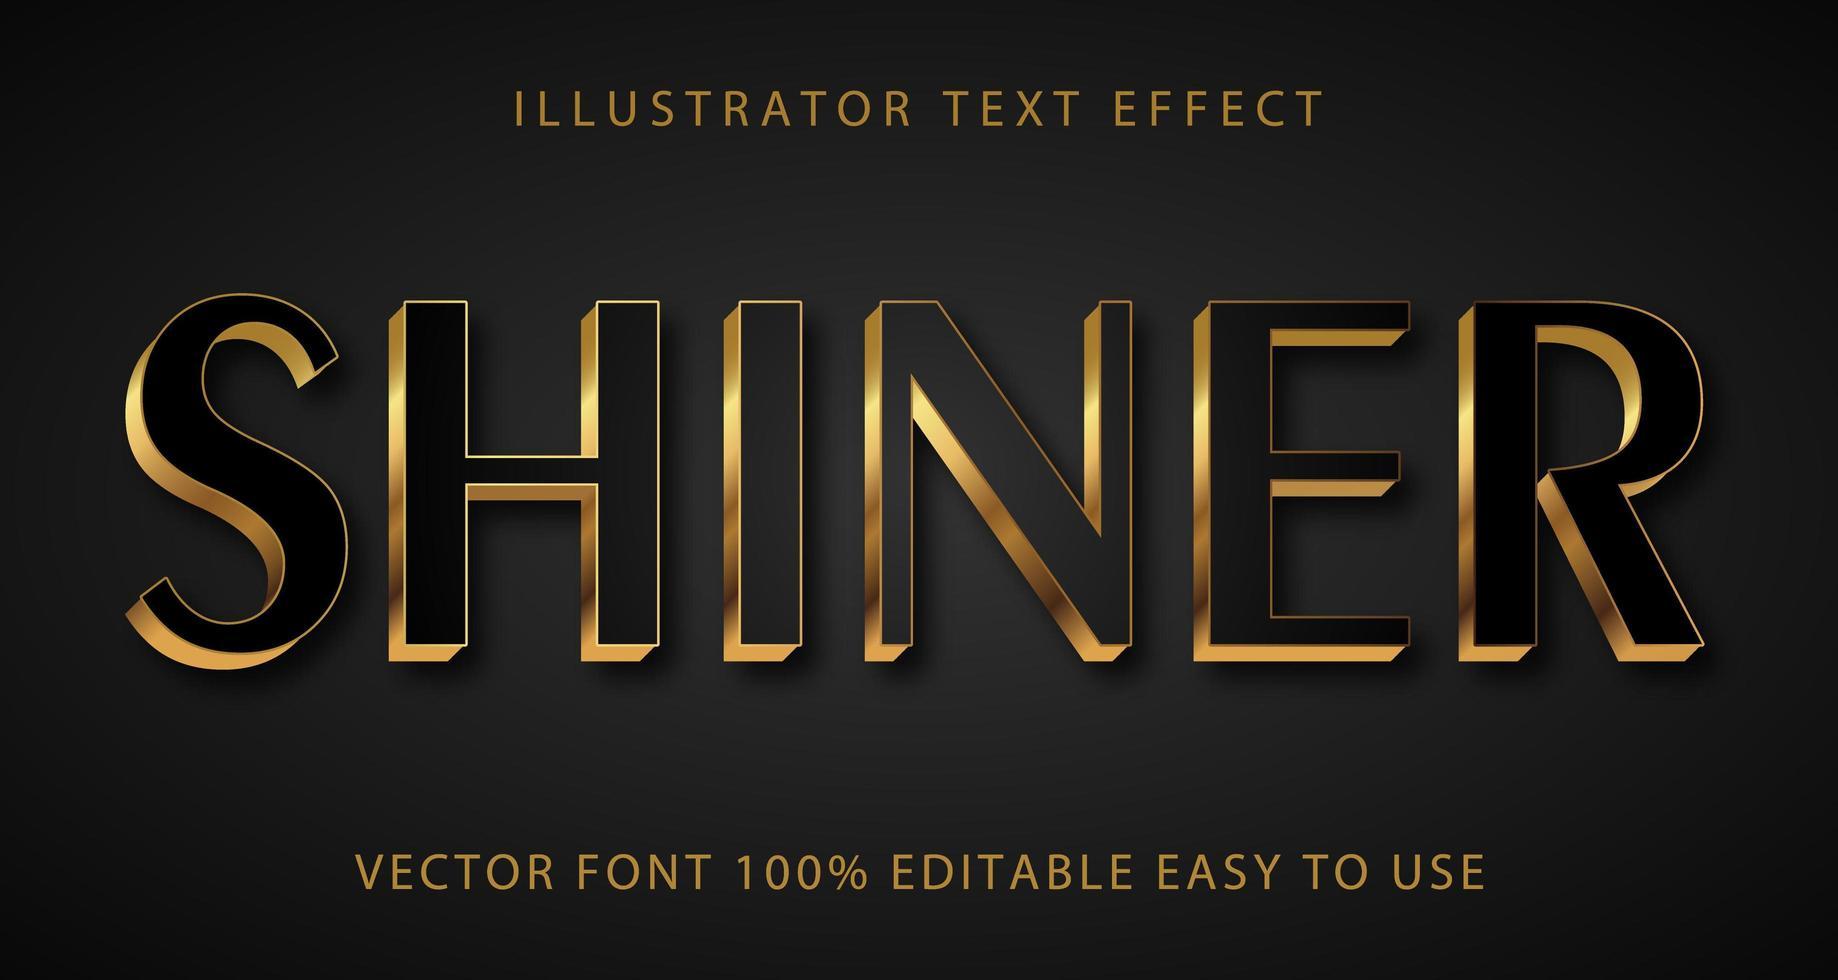 shiner svart, guld accent text effekt vektor